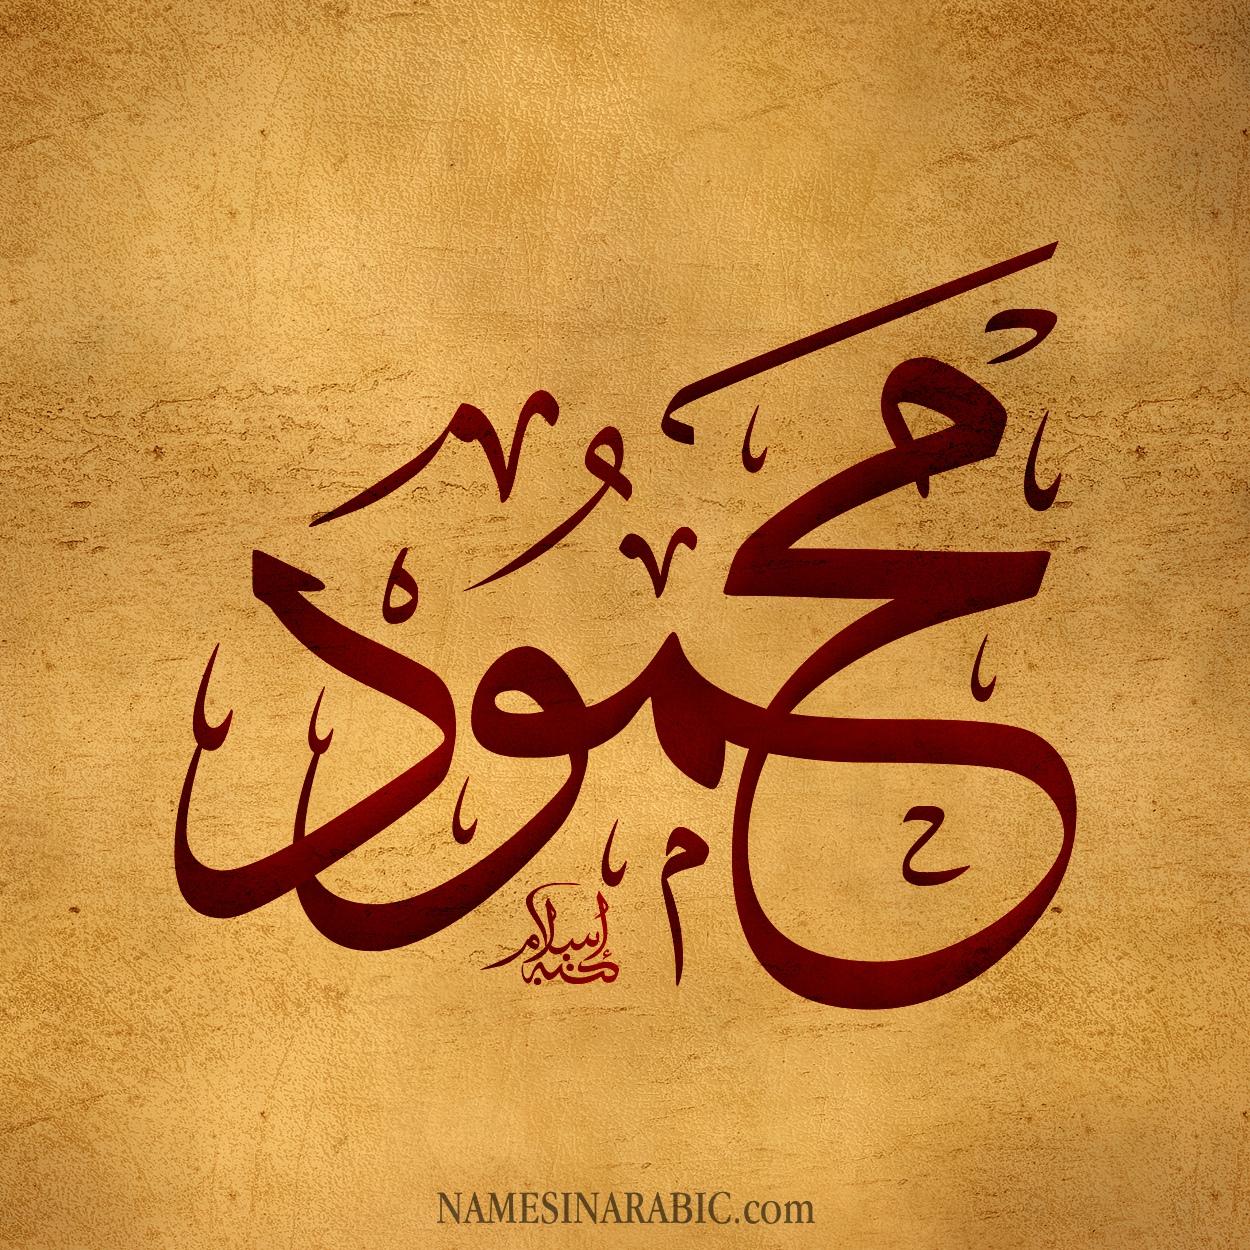 بالصور صور اسم محمود , احلى صورة لاسماء اسم محمود 1103 15